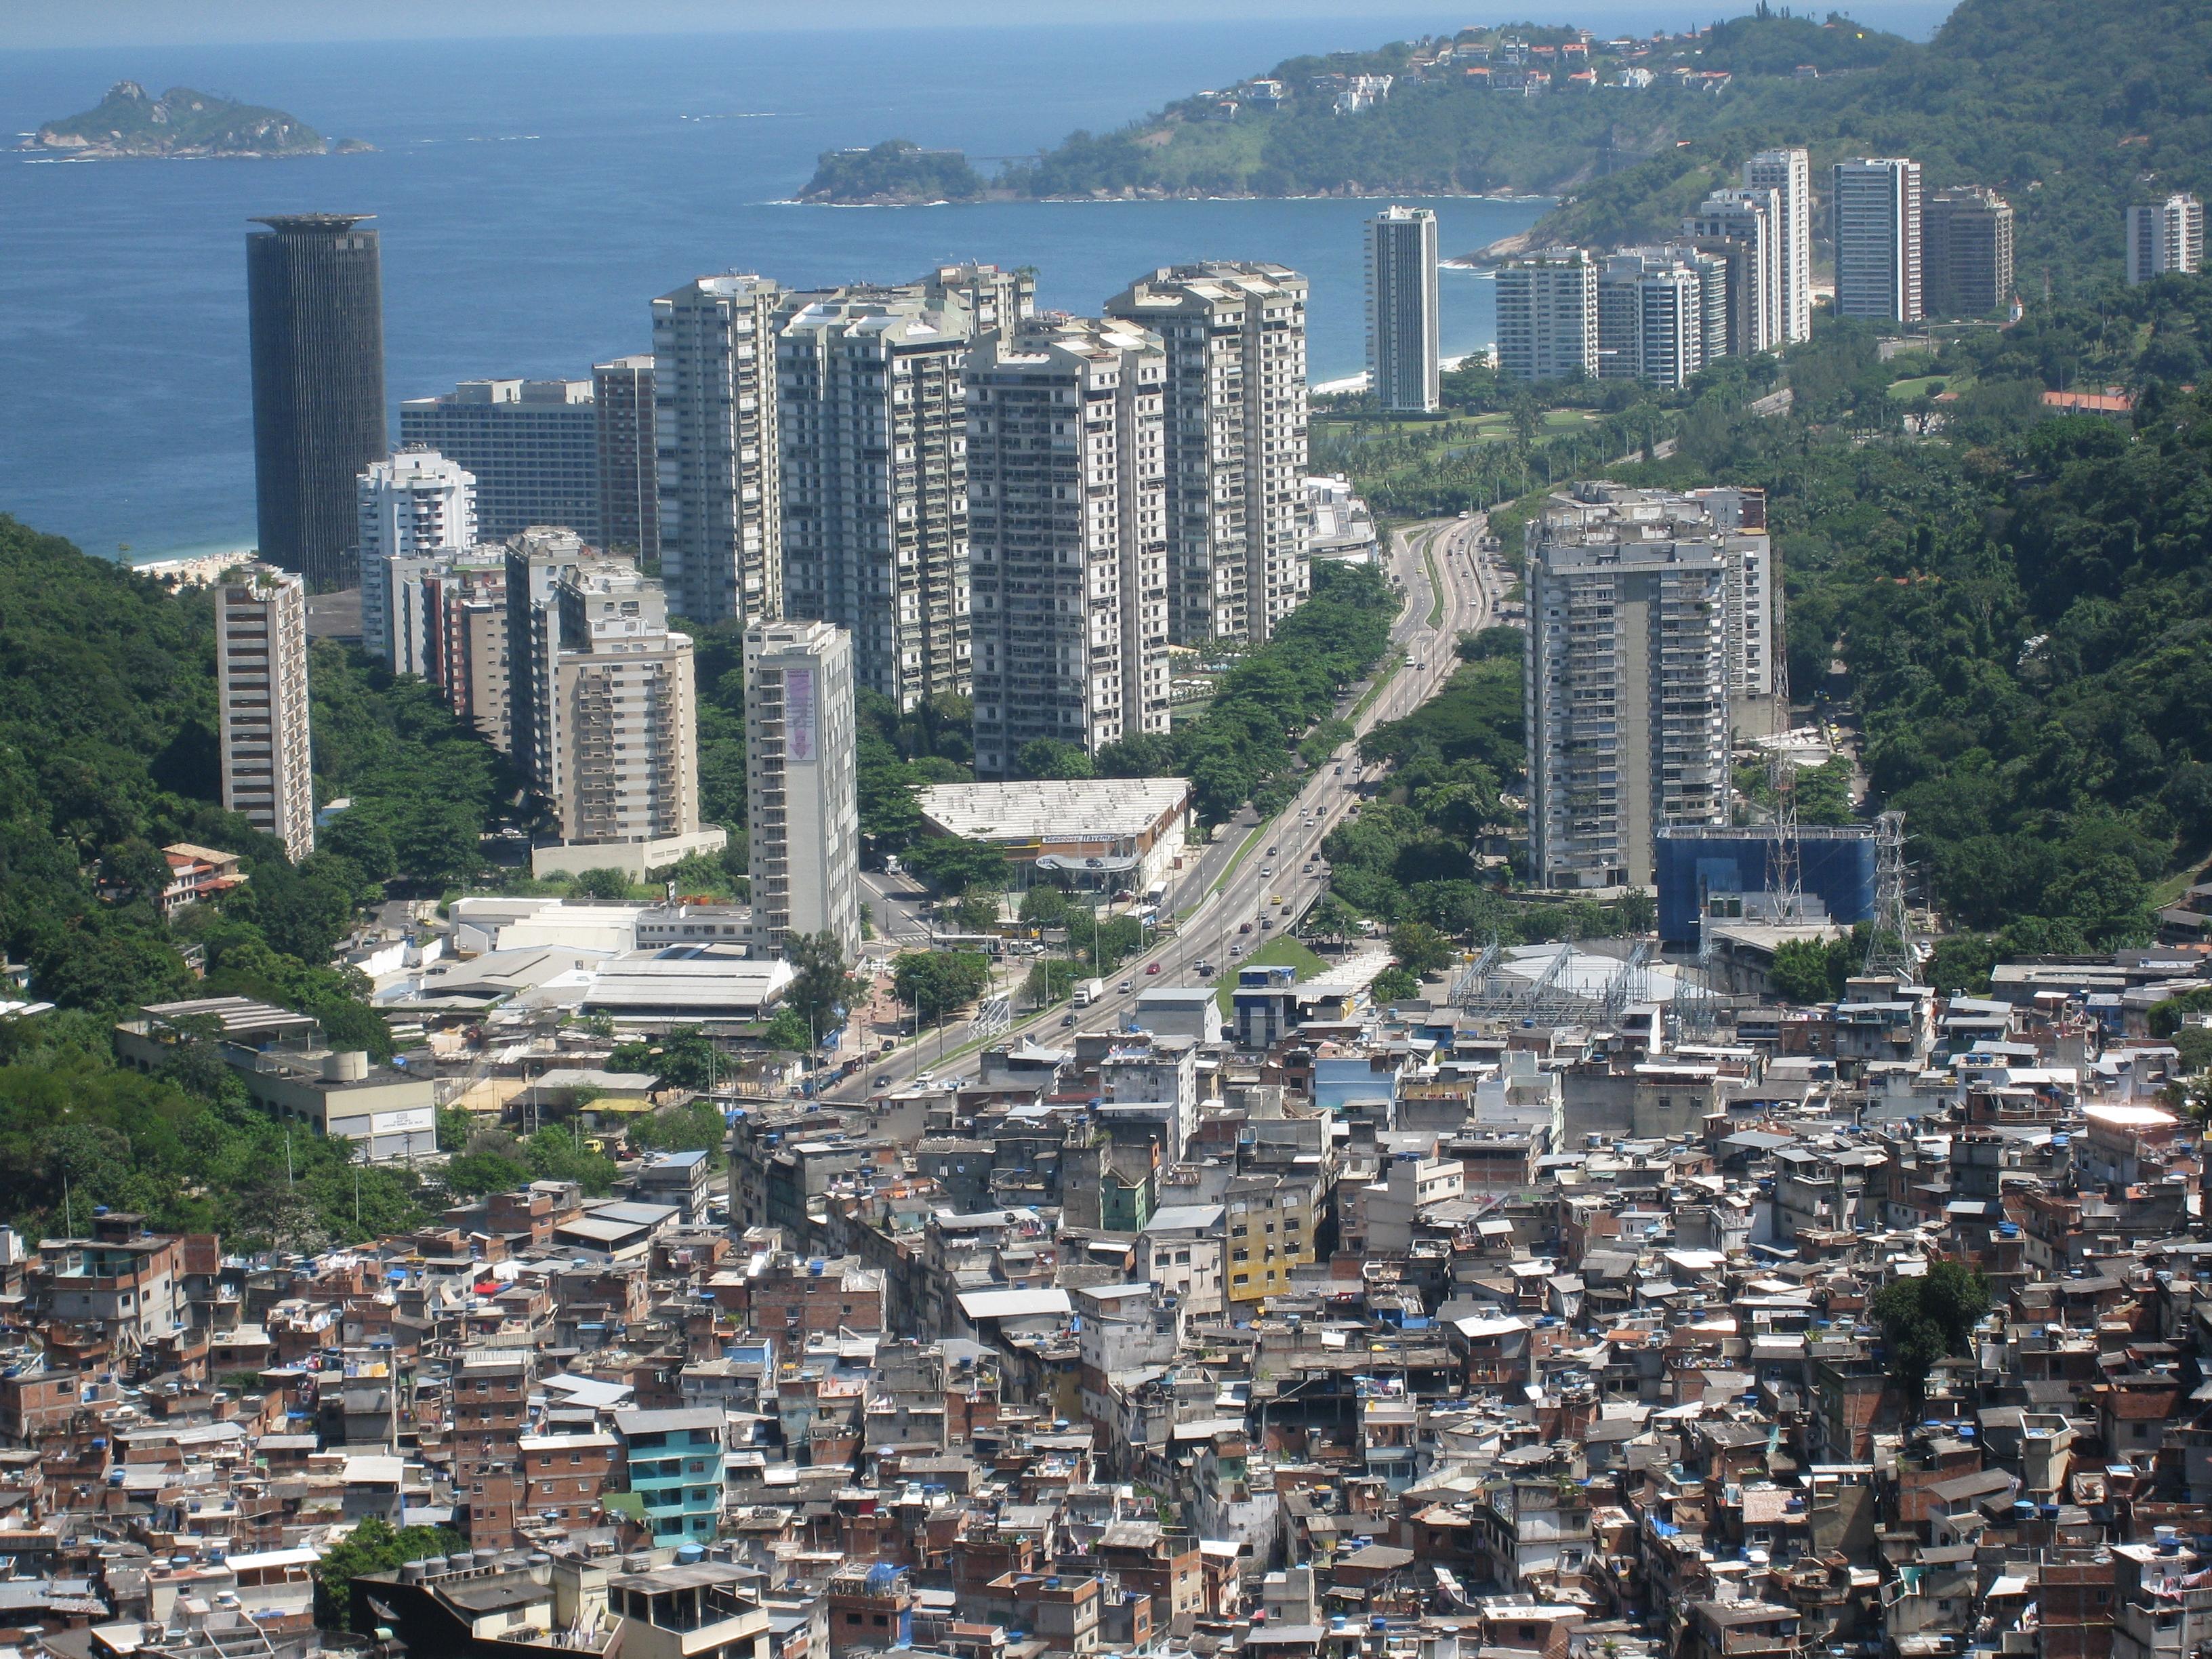 slums during the urbanization process of